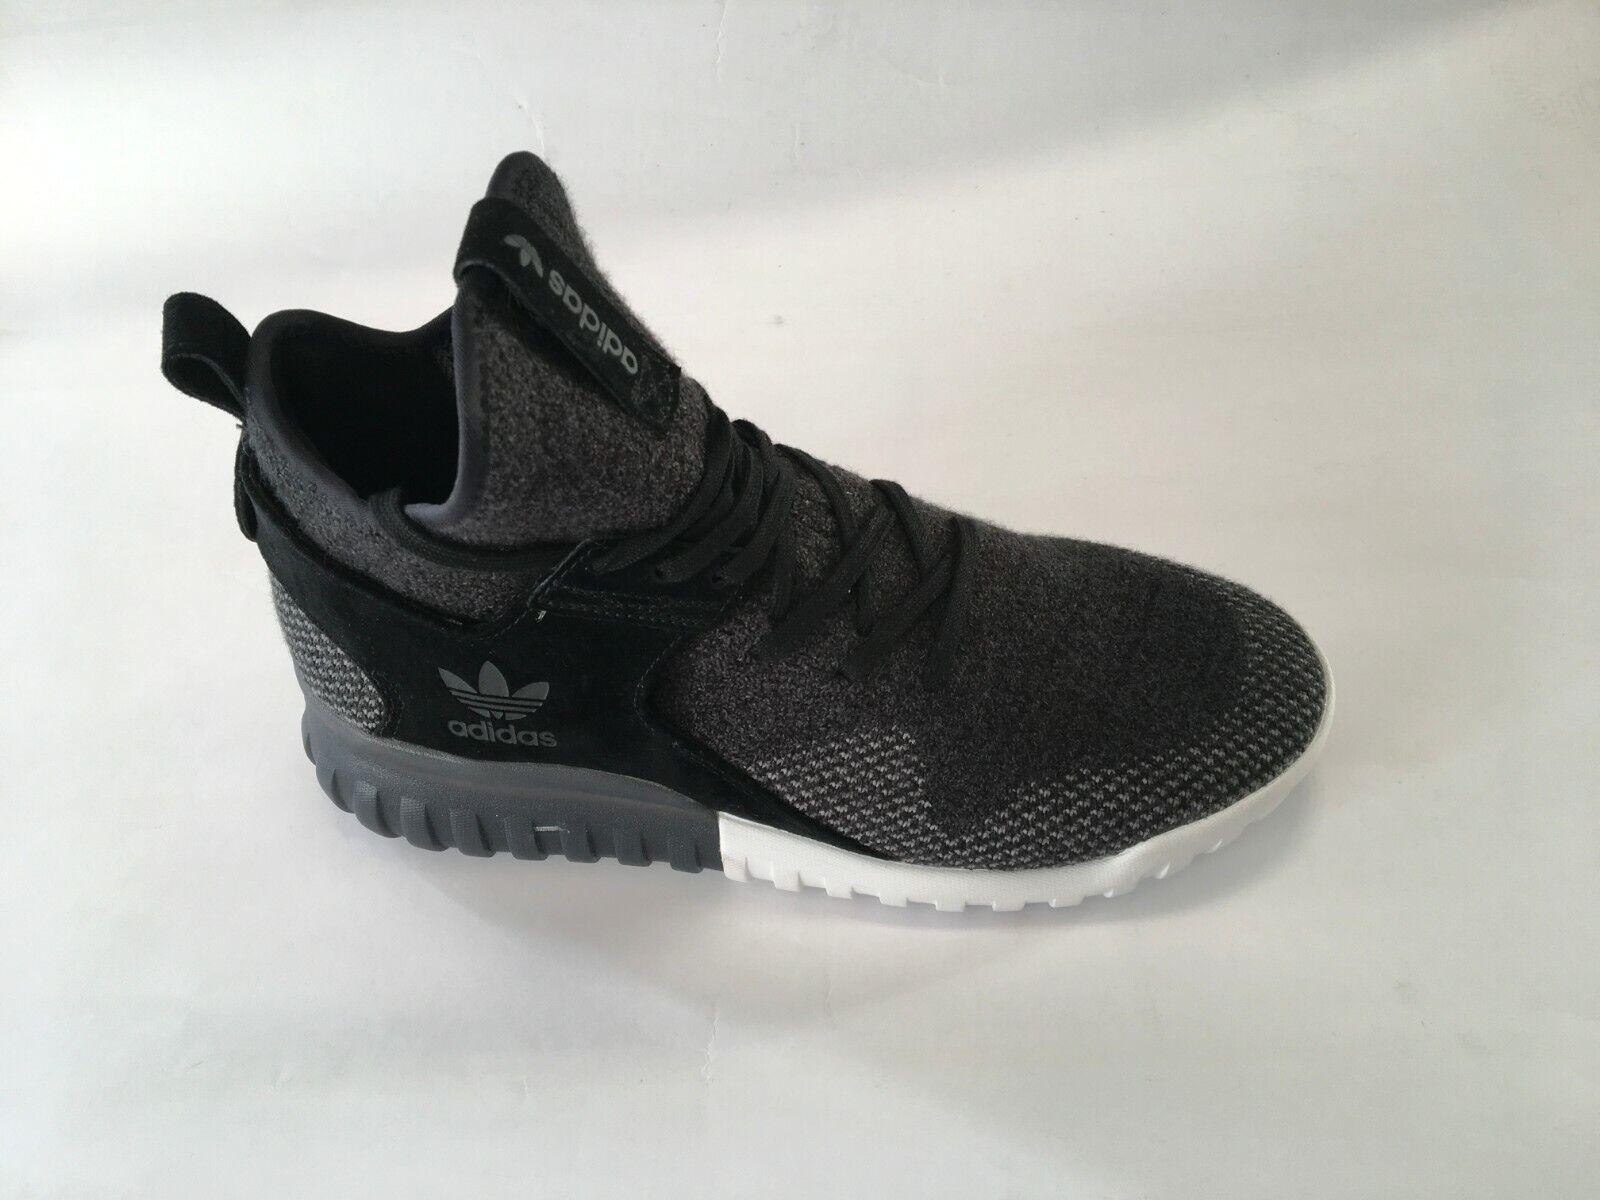 Adidas BB2379 Tubular X Primeknit Schuh schwarz